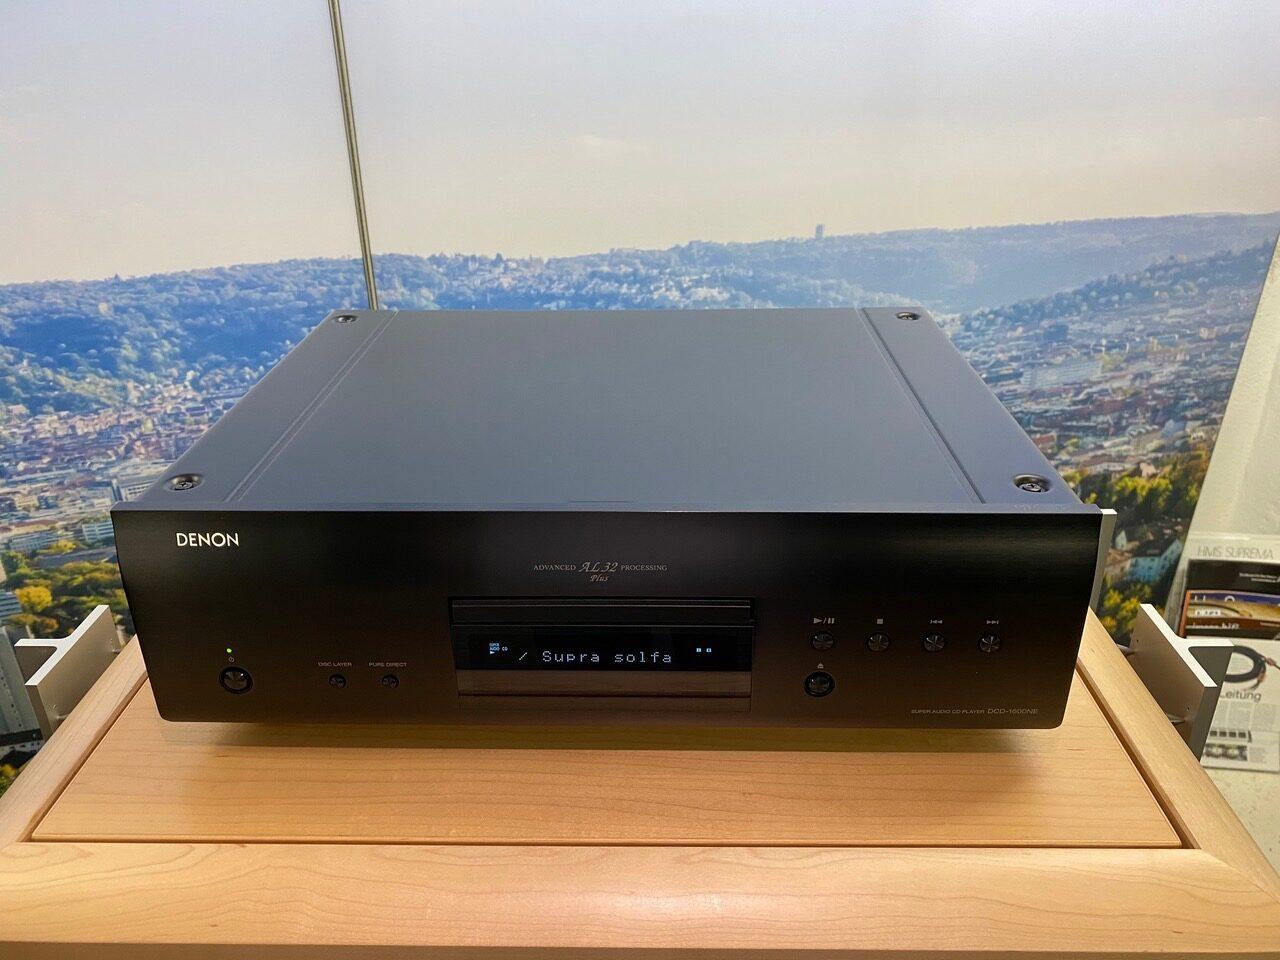 Denon DCD-1600NE | Hochwertiger Super Audio CD-Player - in Stuttgart